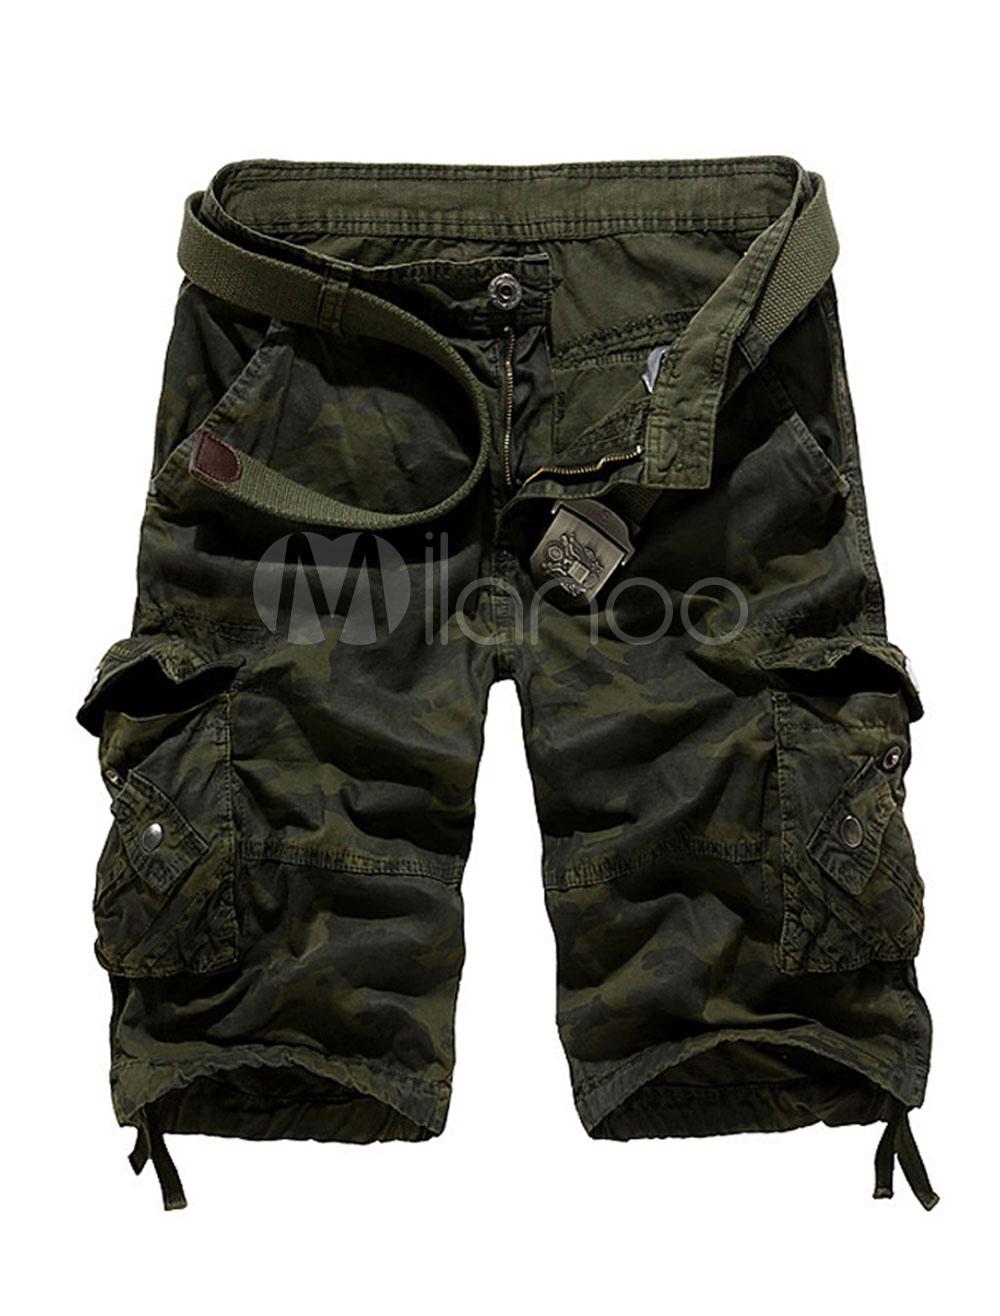 Men Cargo Shorts Pocket Cotton Shorts Zipper Fly Summer Shorts Casual